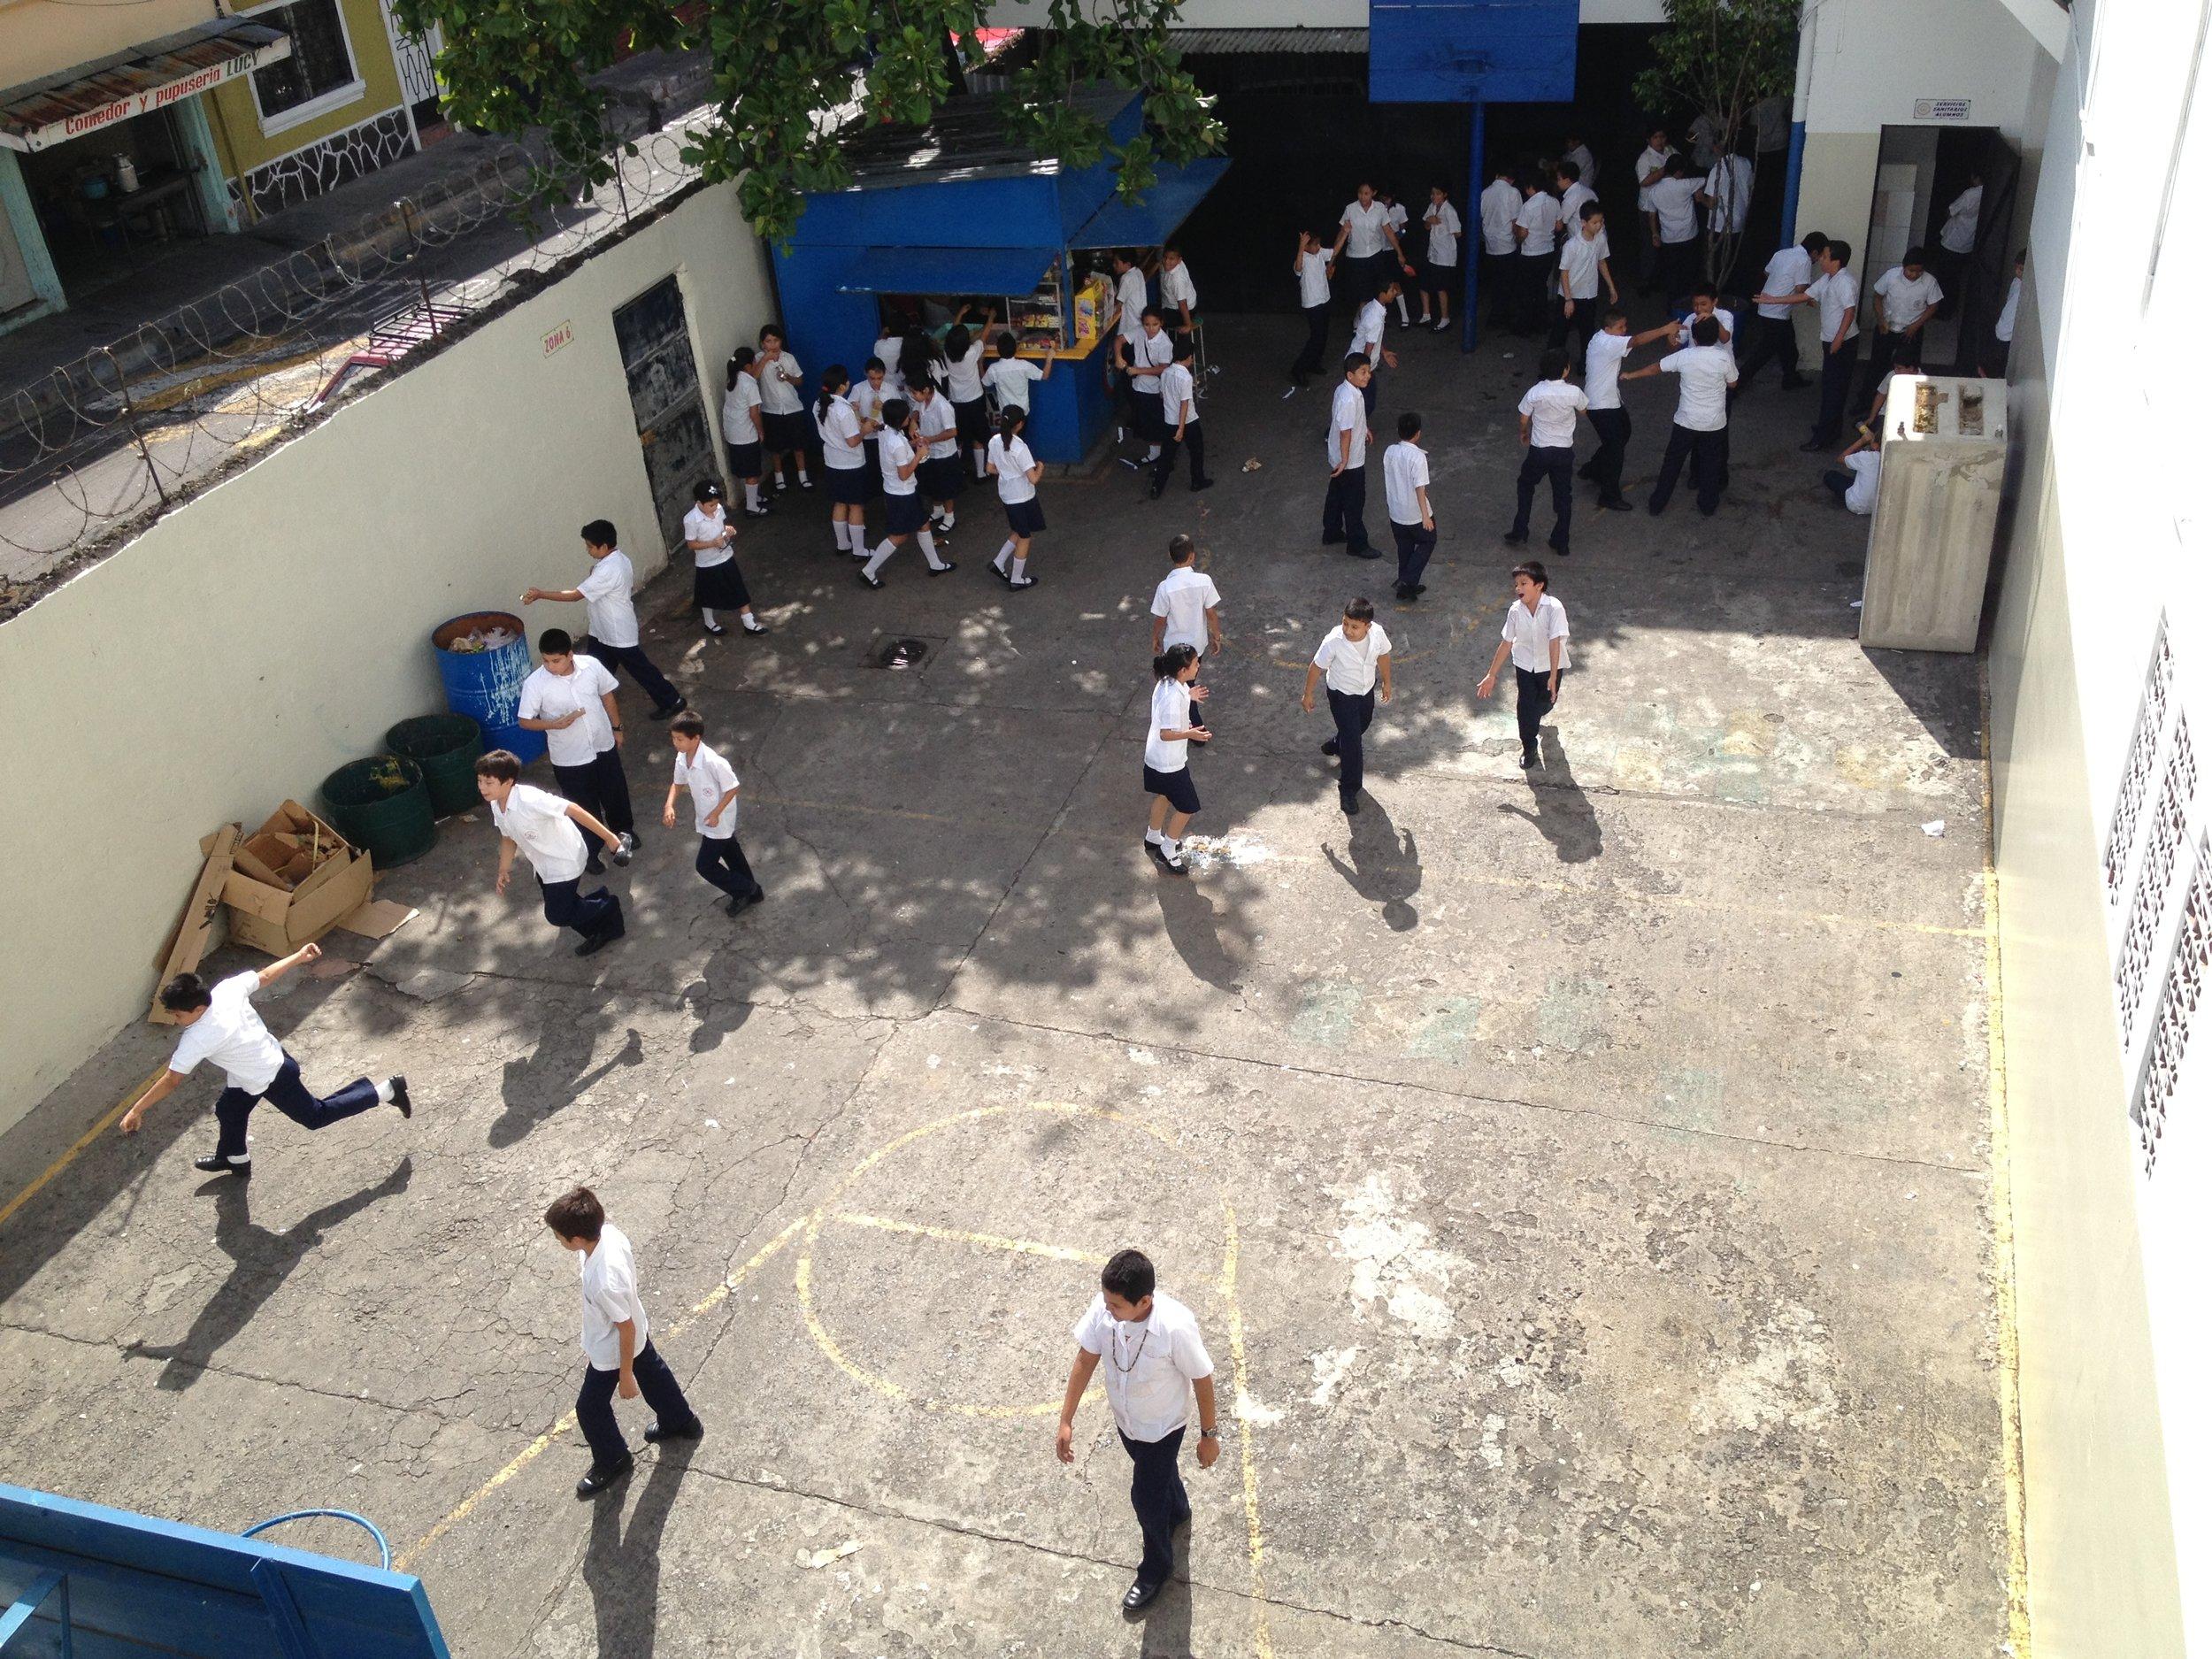 Recess in San Salvador